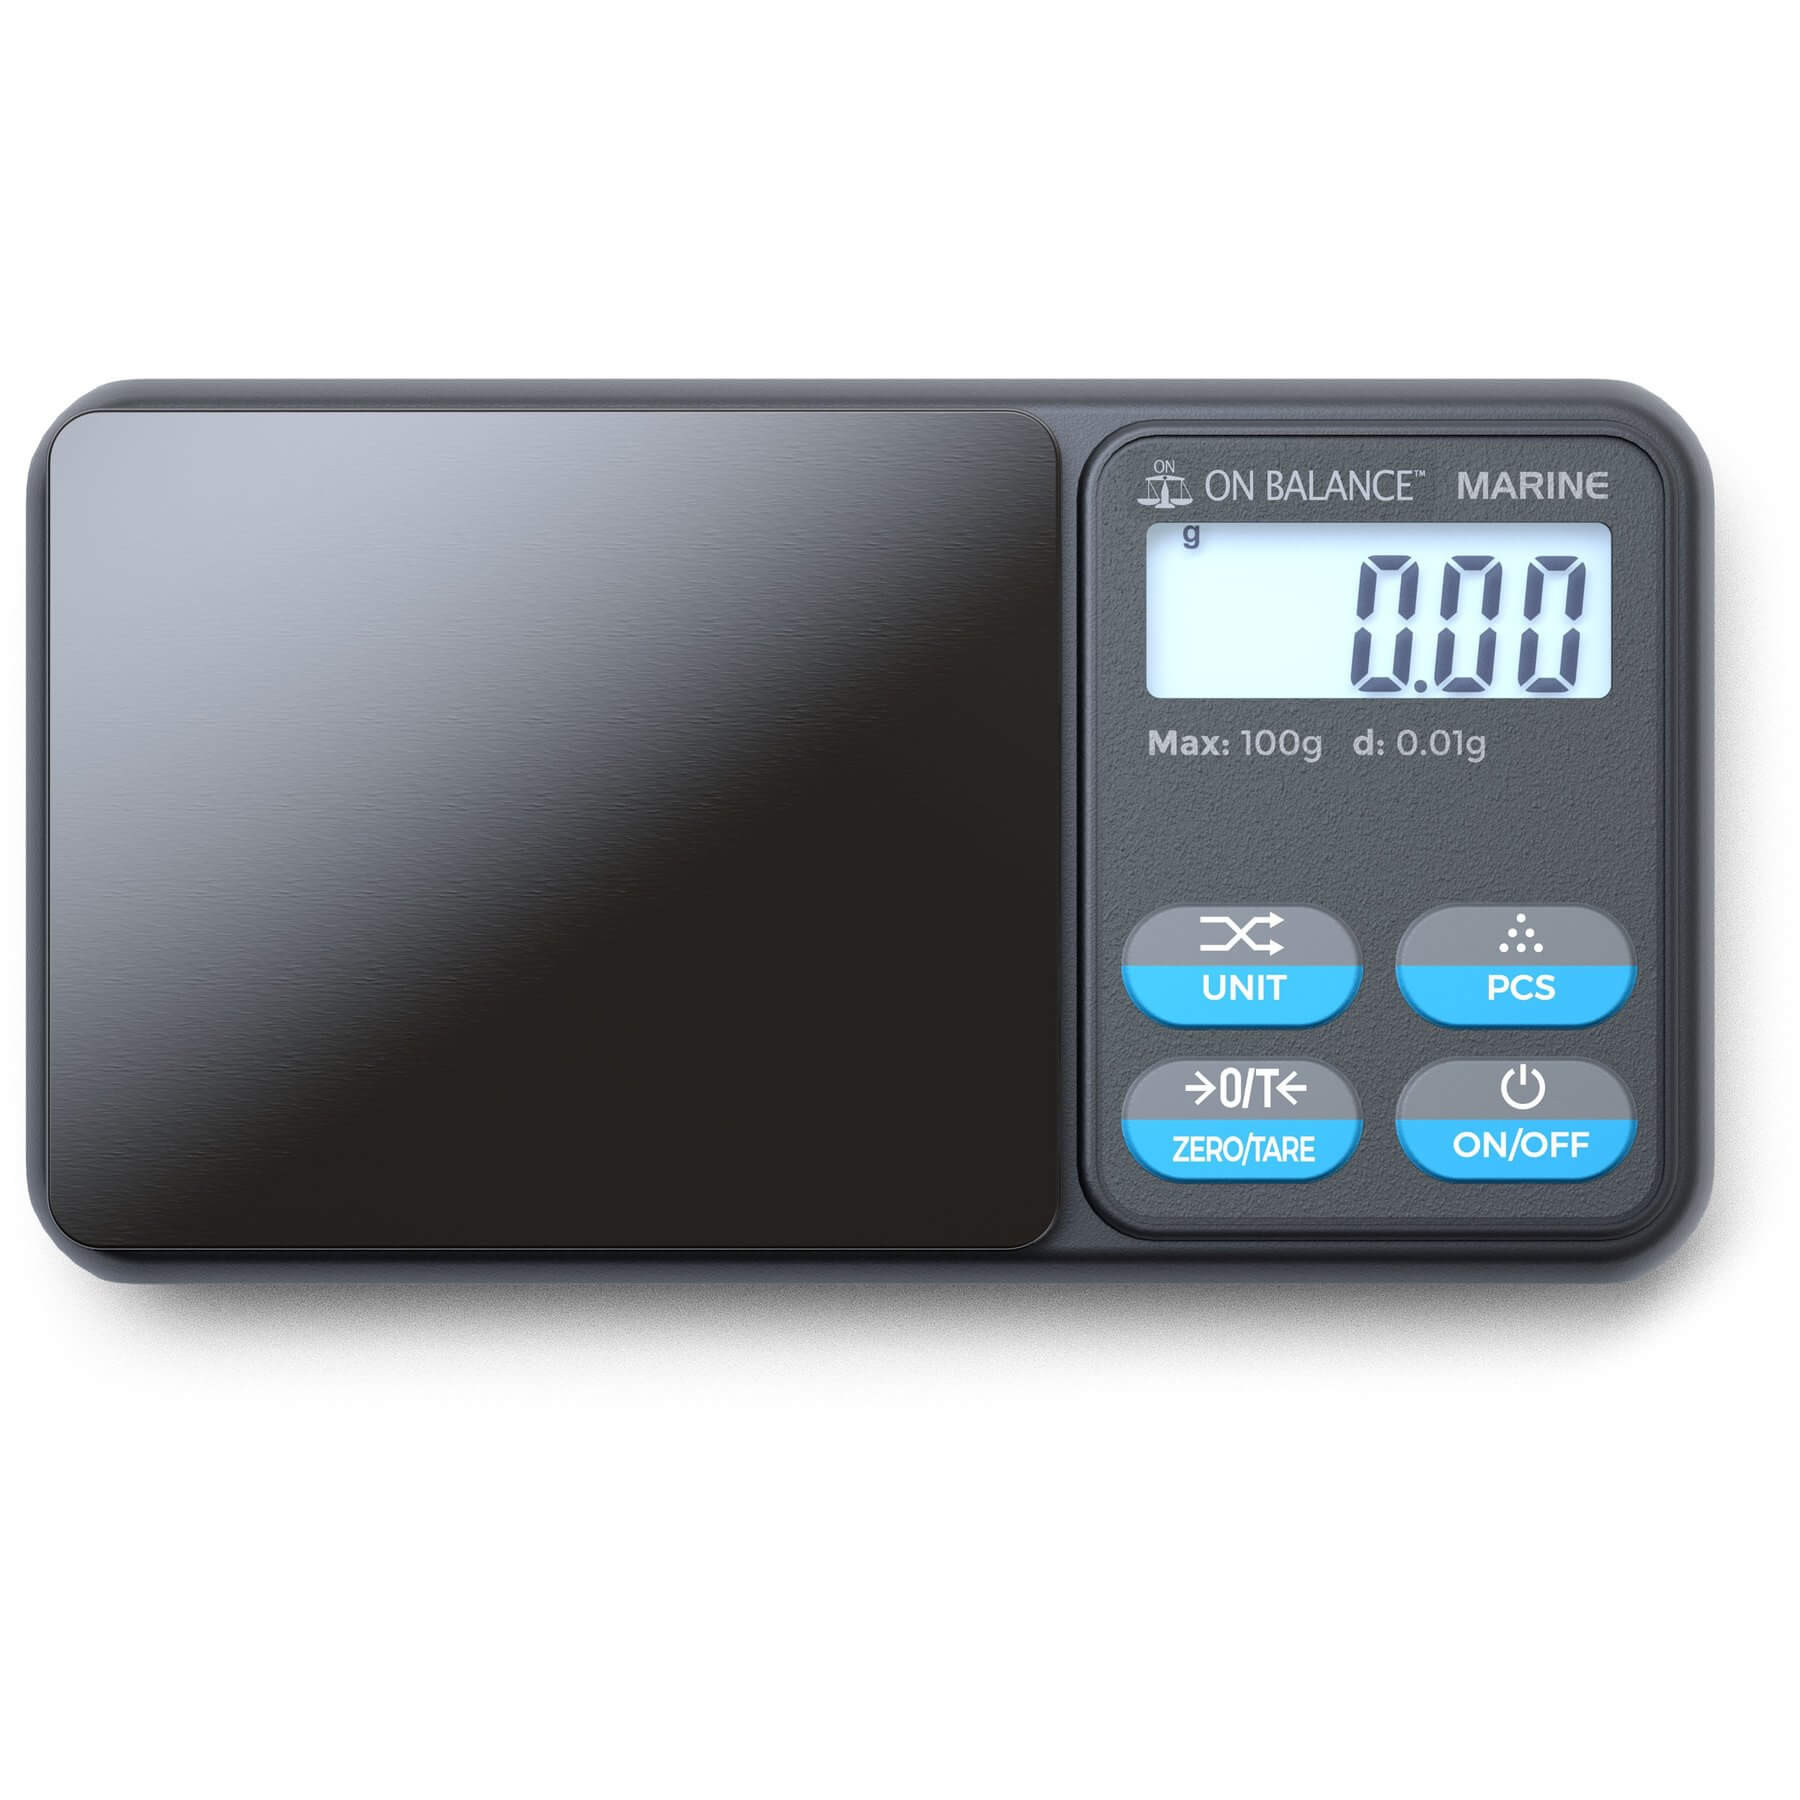 On Balance MAR-100 Marine IP-65 Rated Mini Scale (100g x 0.01g)